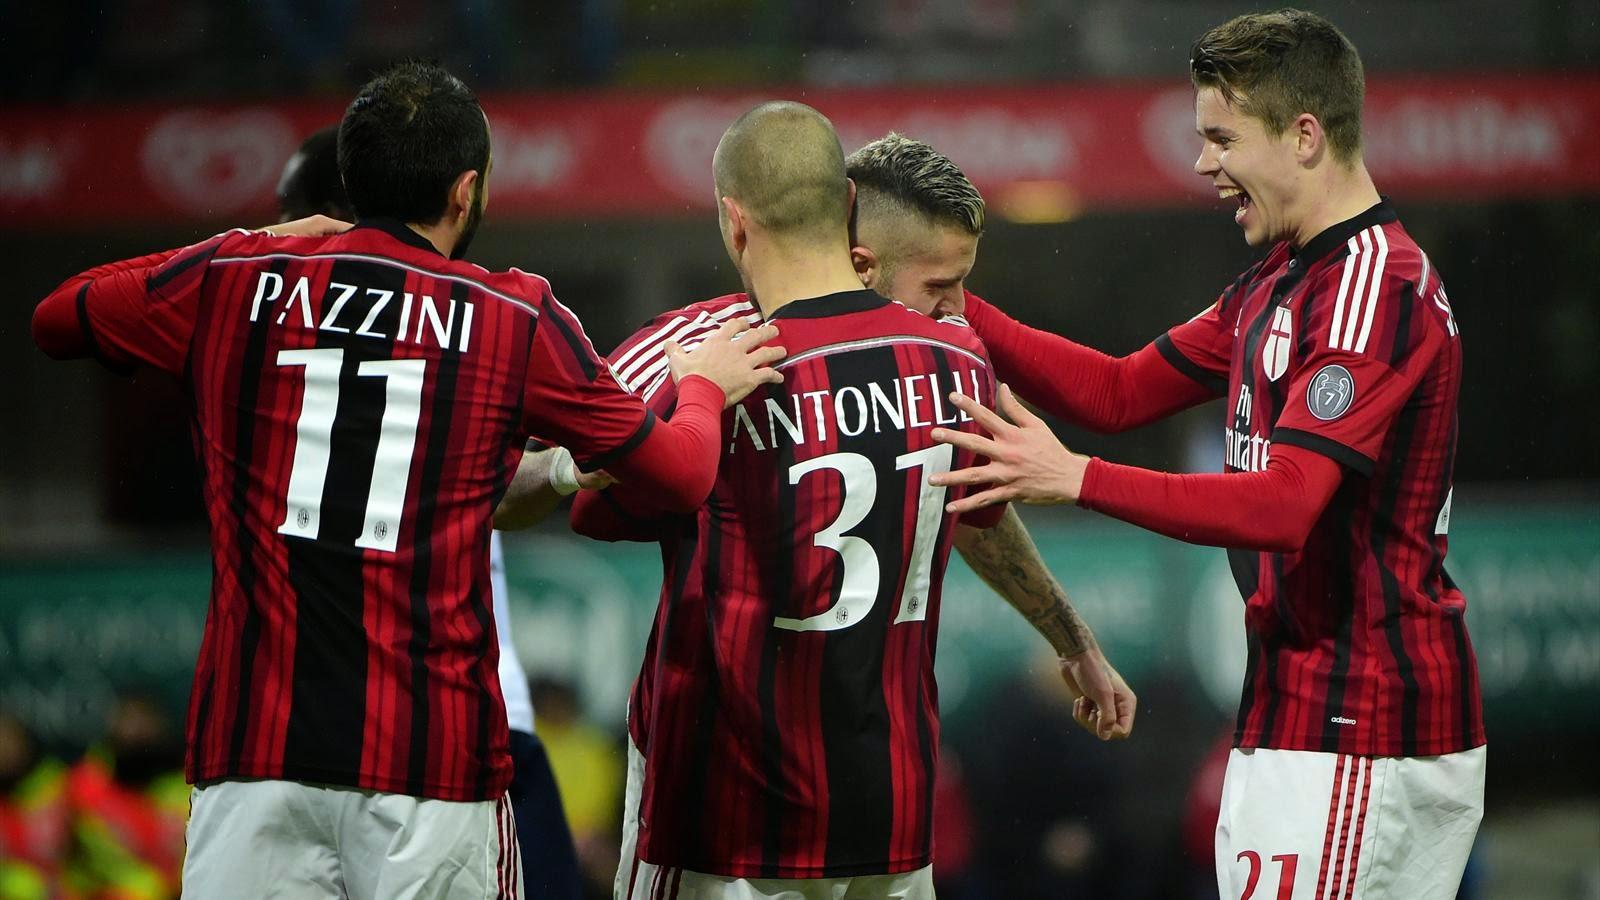 Pronostic Inter Milan - Milan : Serie A